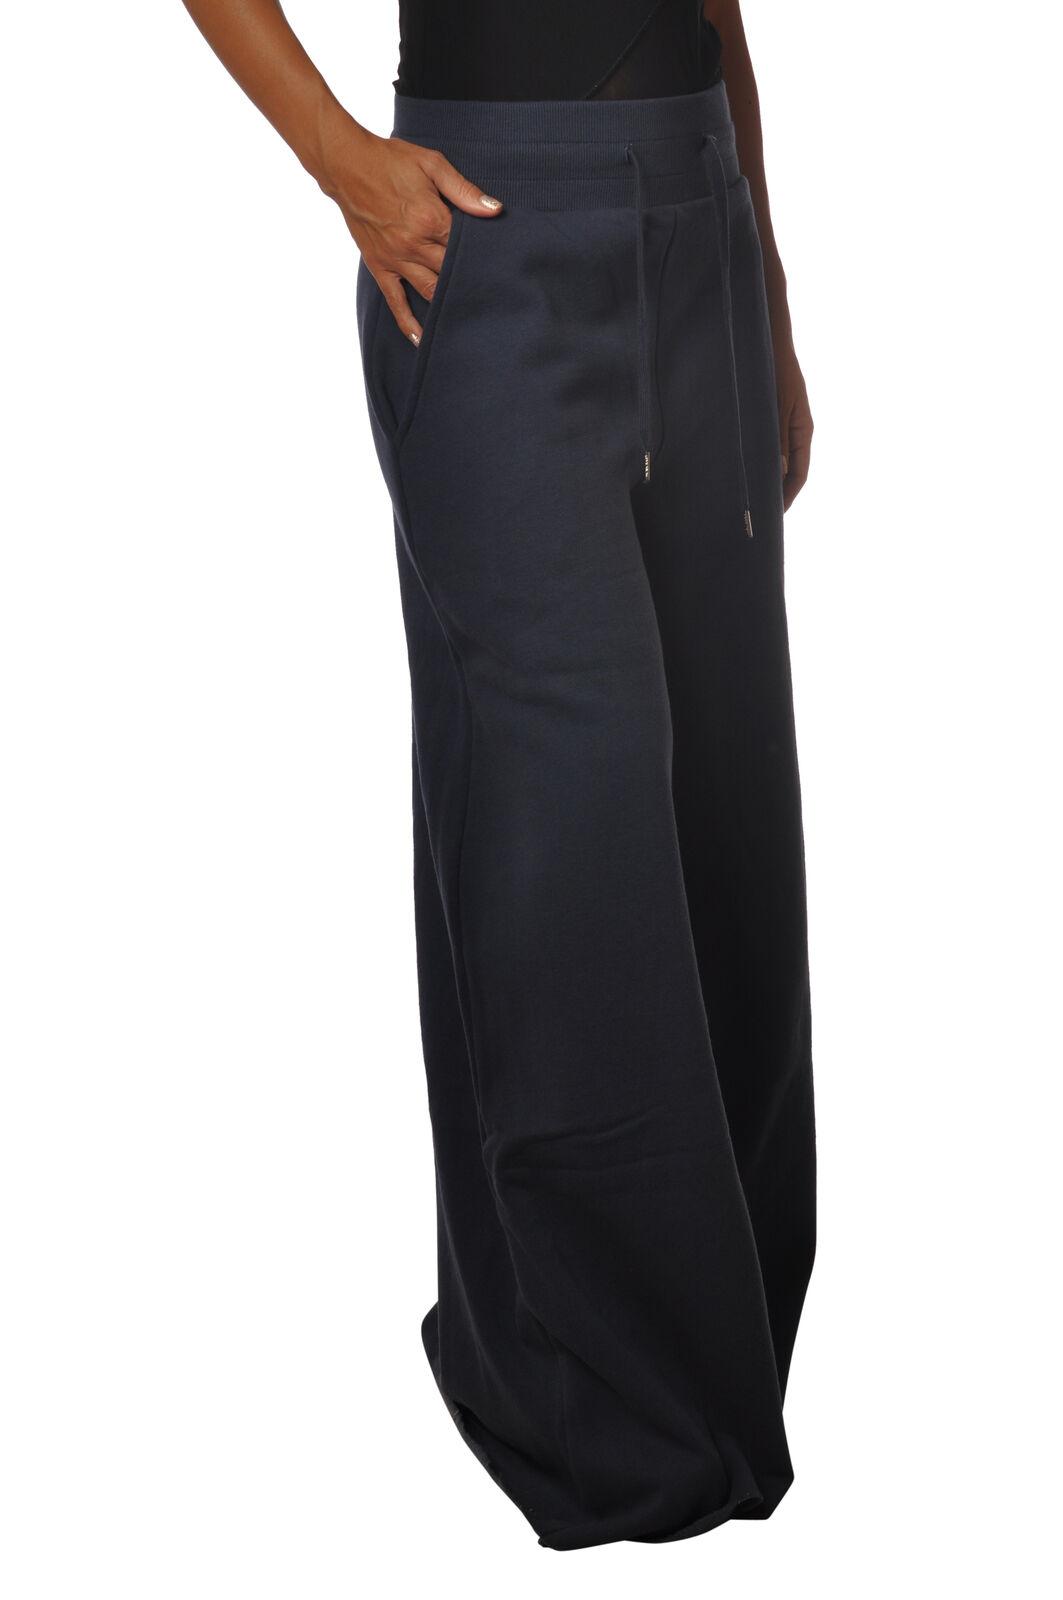 5 Preview - Pants, Trousers, sweatshirt - Woman  - azul - 5508405M184355  suministro de productos de calidad